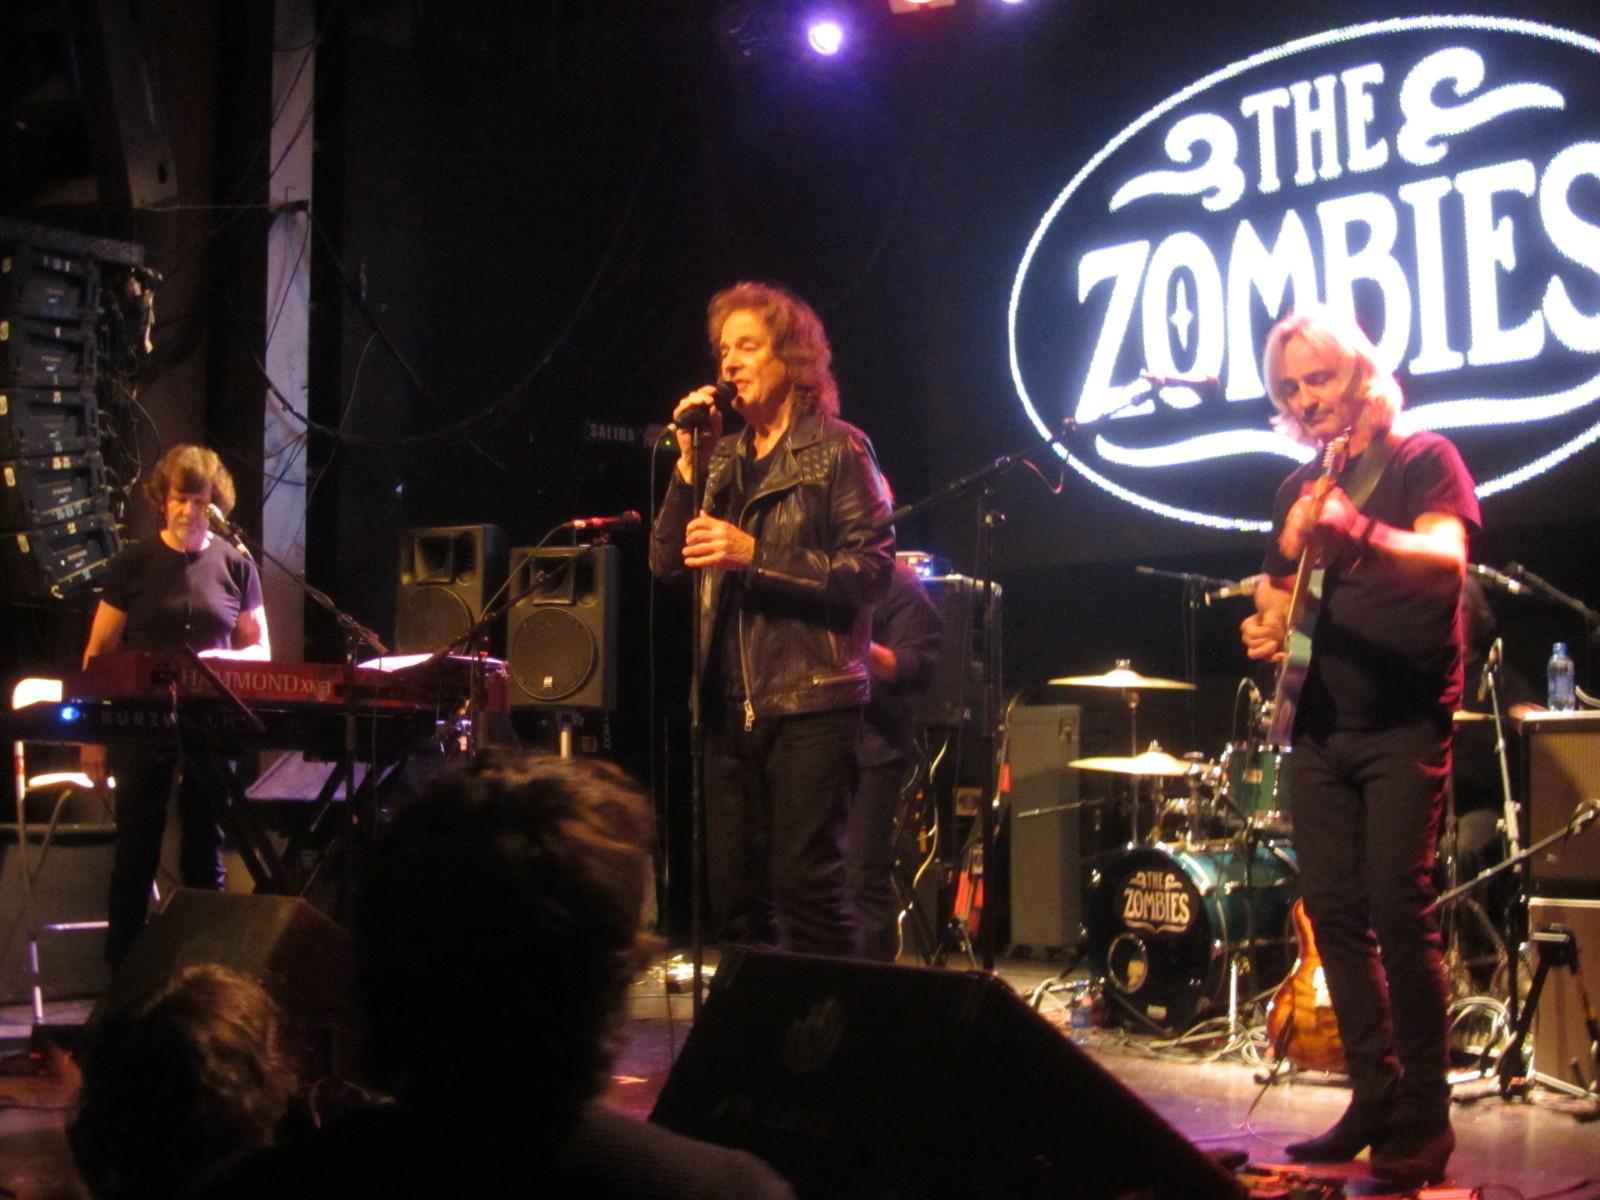 The Zombies - Página 2 Jfz2w5